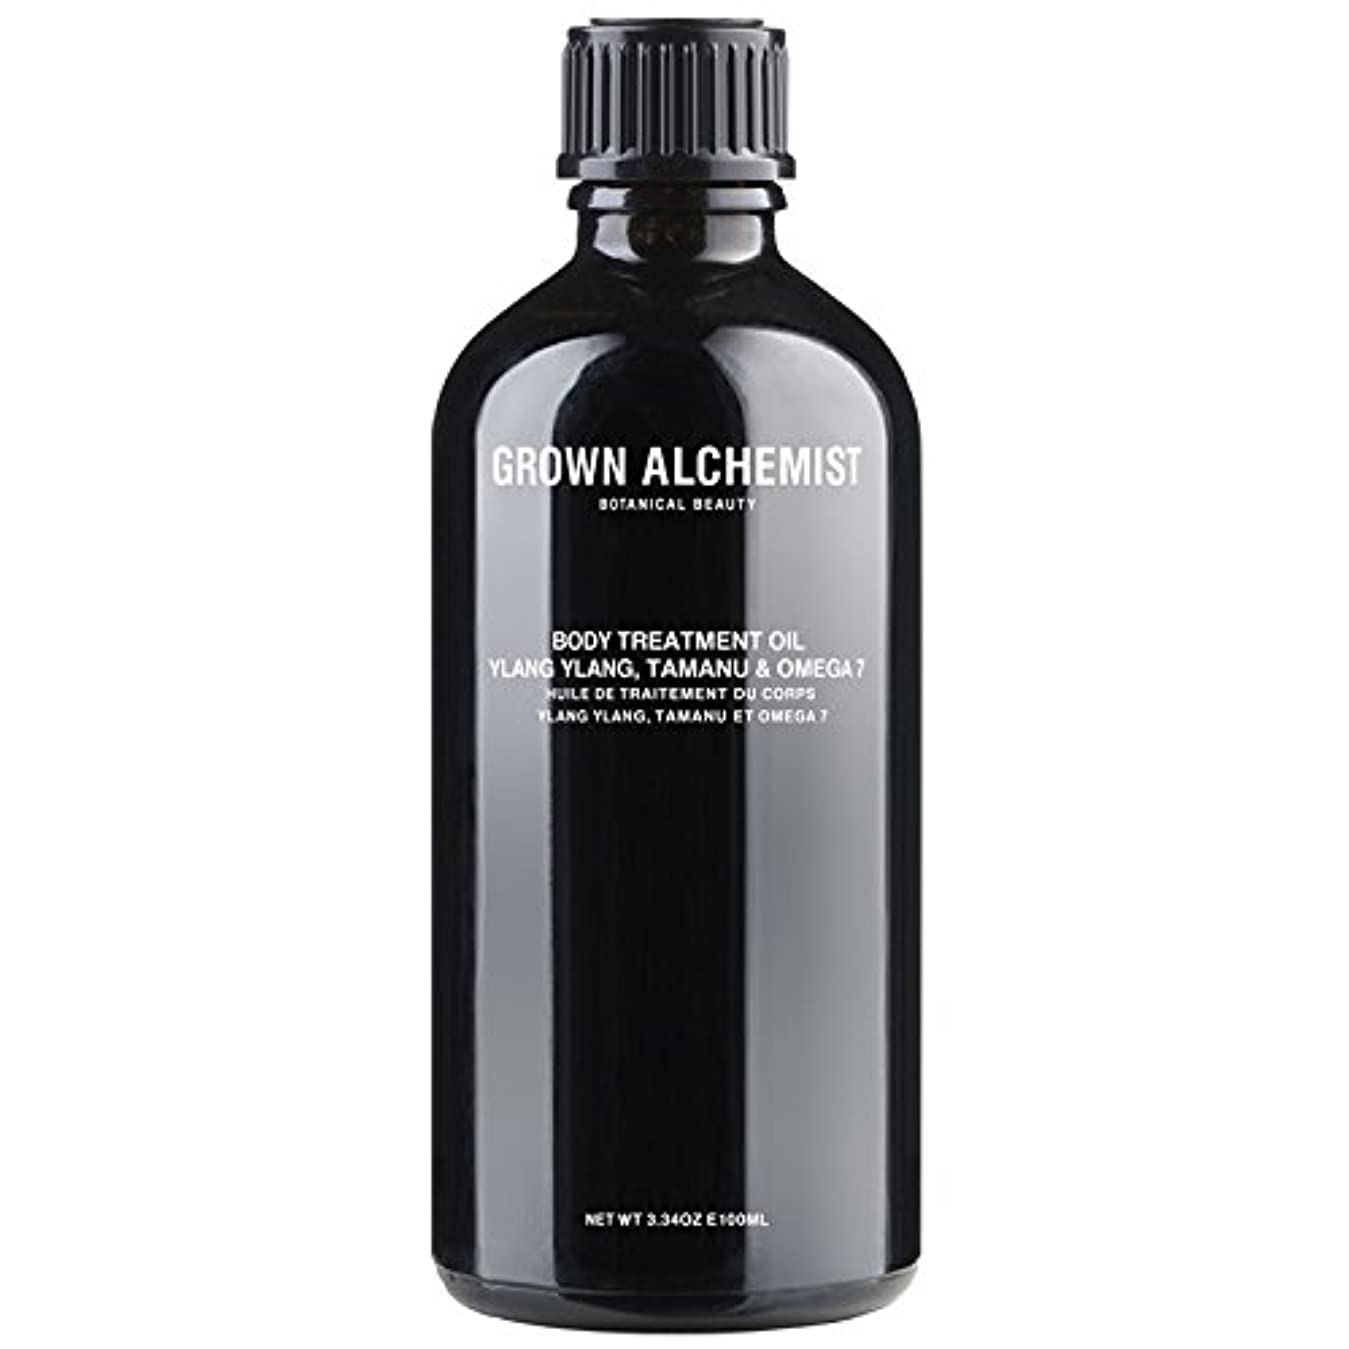 Grown Alchemist Body Treatment Oil - Ylang Ylang, Tamanu & Omega 7 100ml/3.34oz並行輸入品